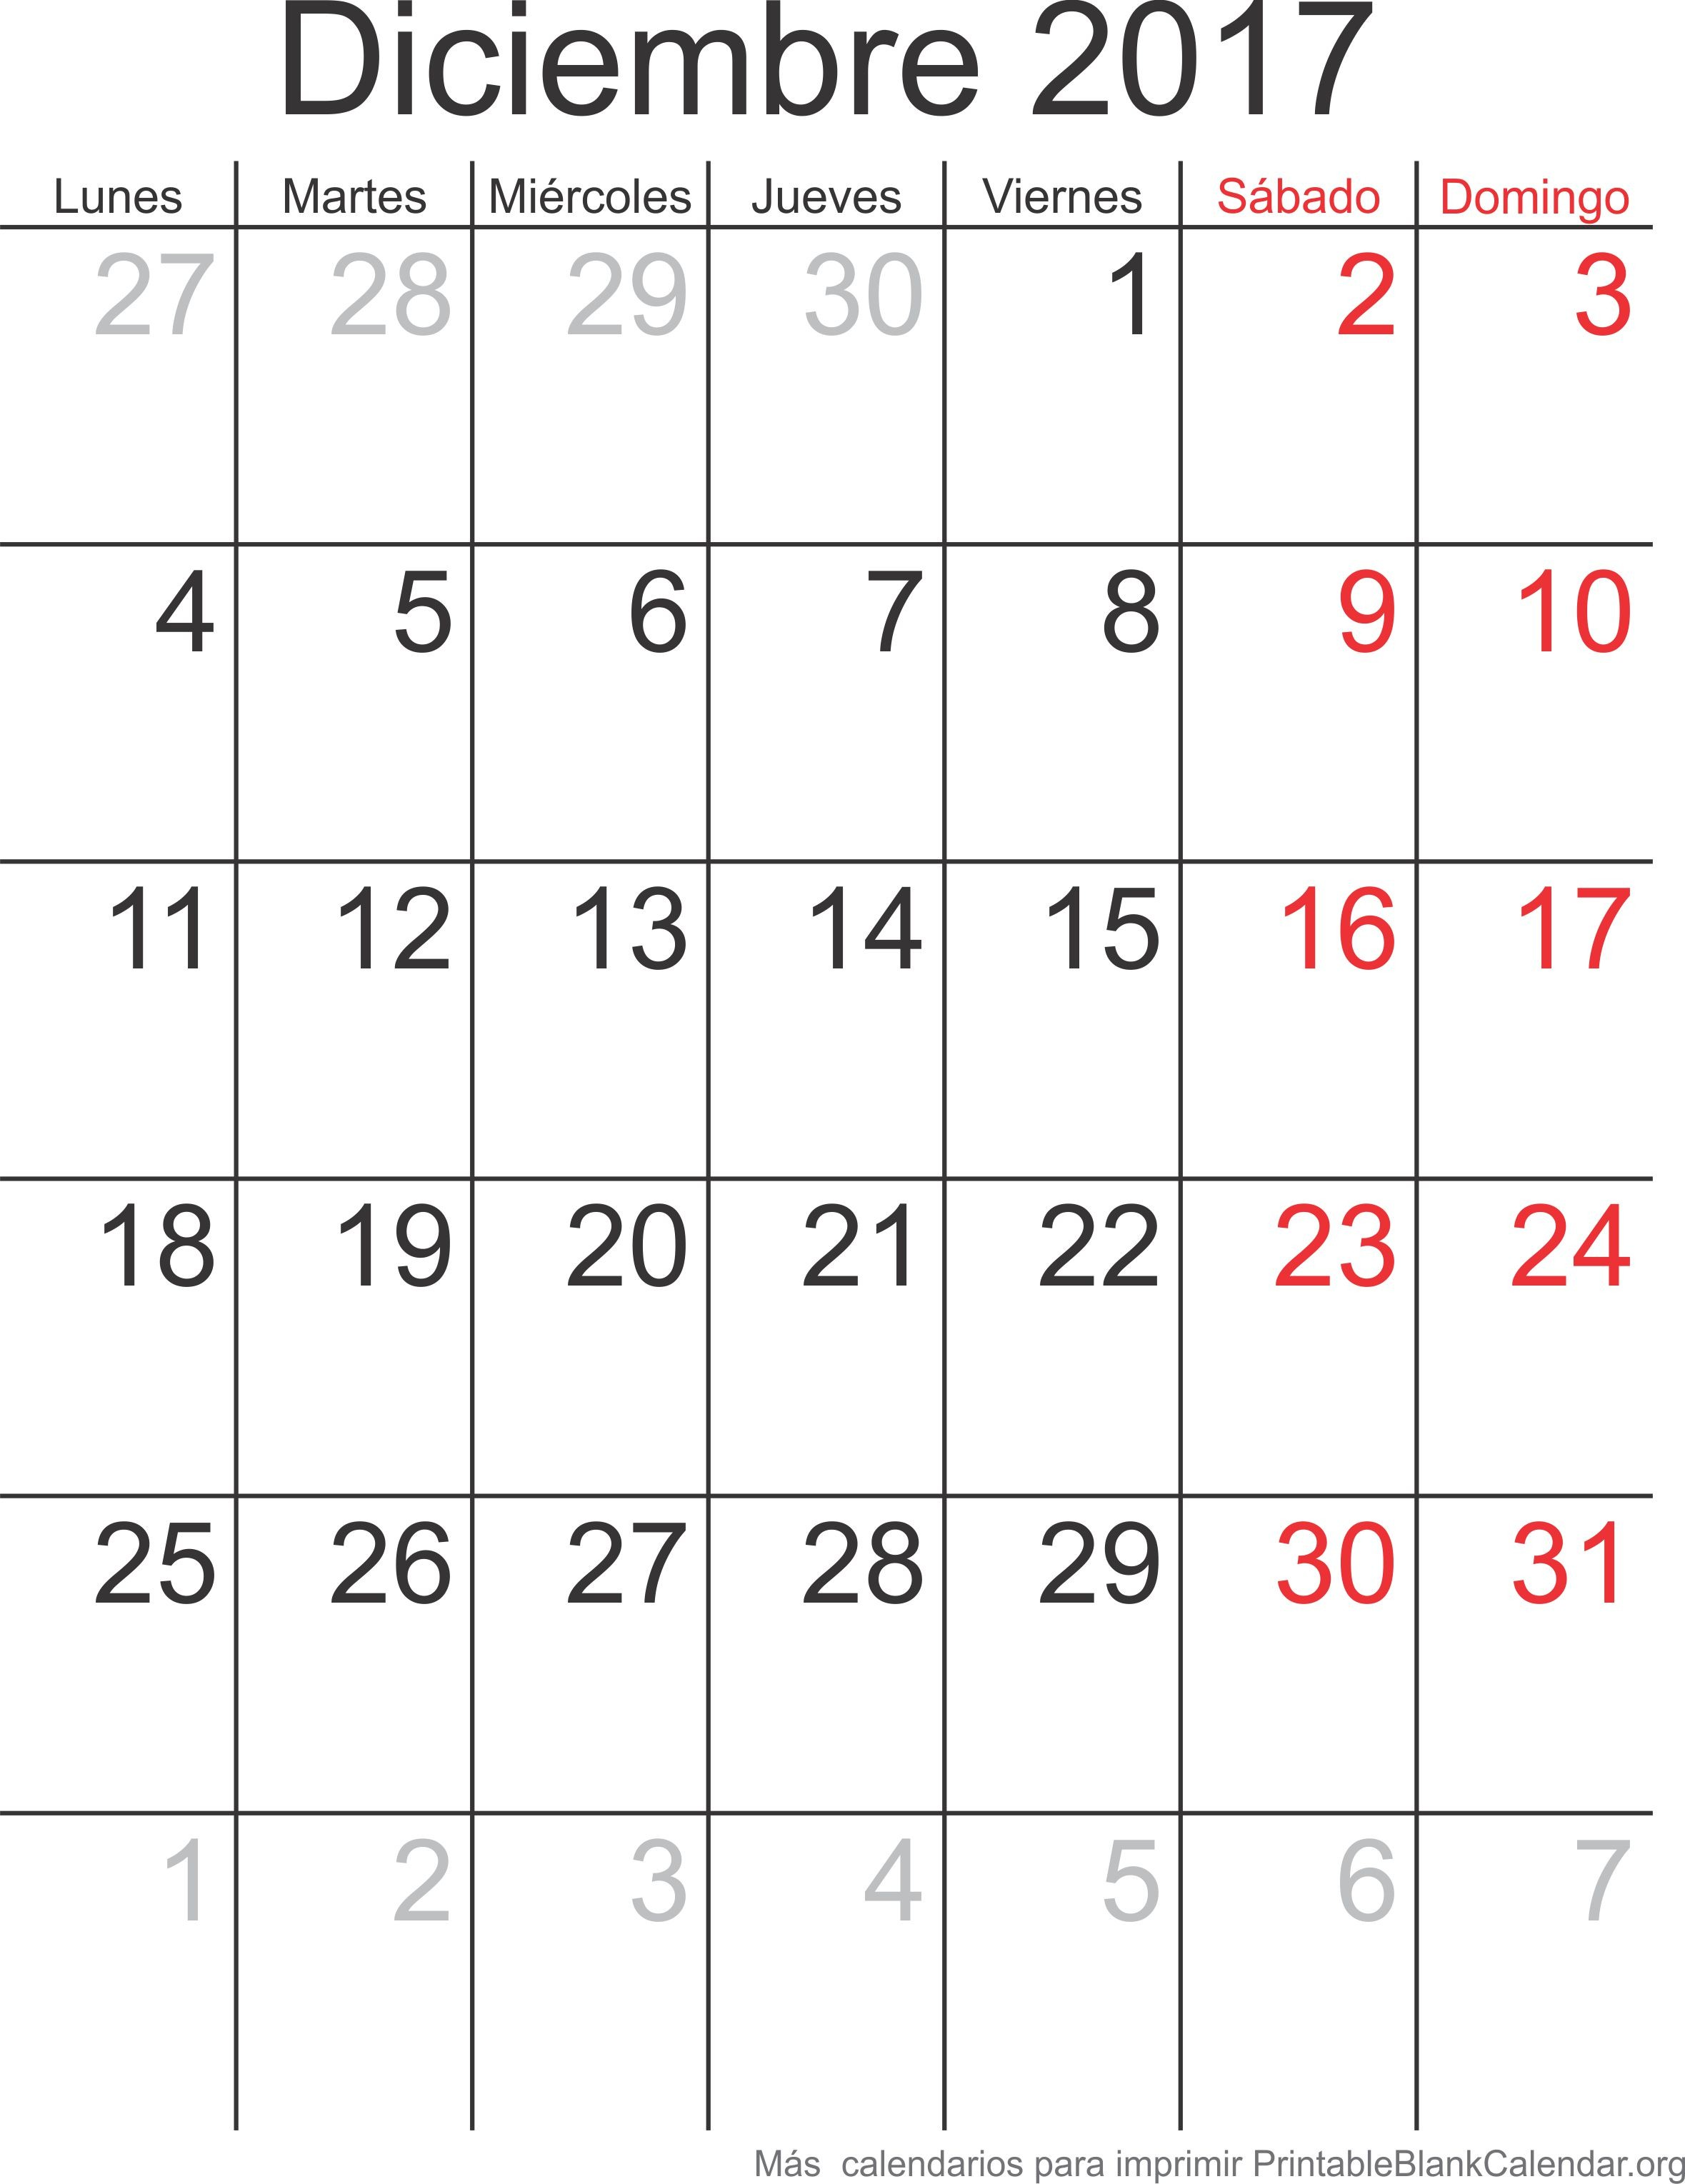 Calendario 2017 Para Imprimir De Lunes A Domingo Más Caliente Diciembre 2017 Calendario Para Imprimir Calendarios Para Imprimir